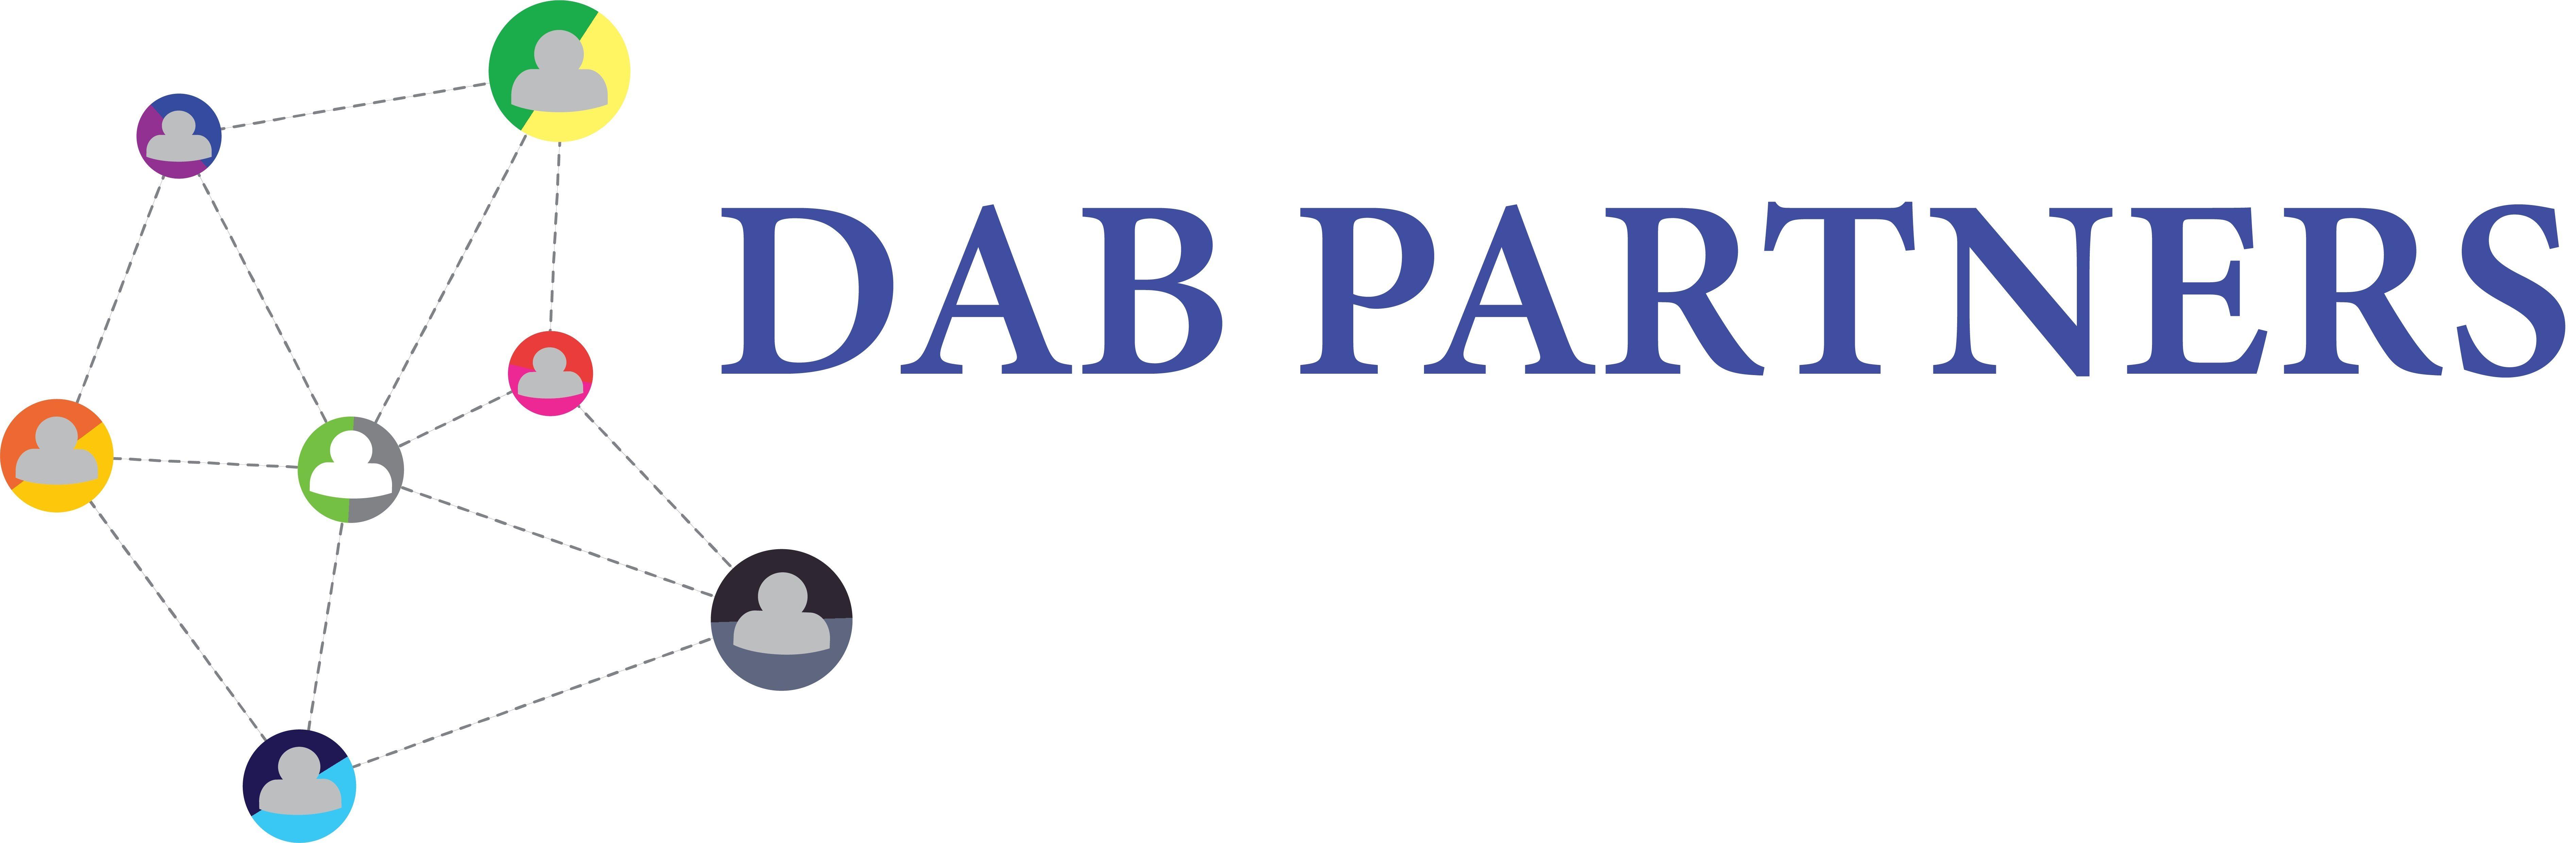 DAB Partners